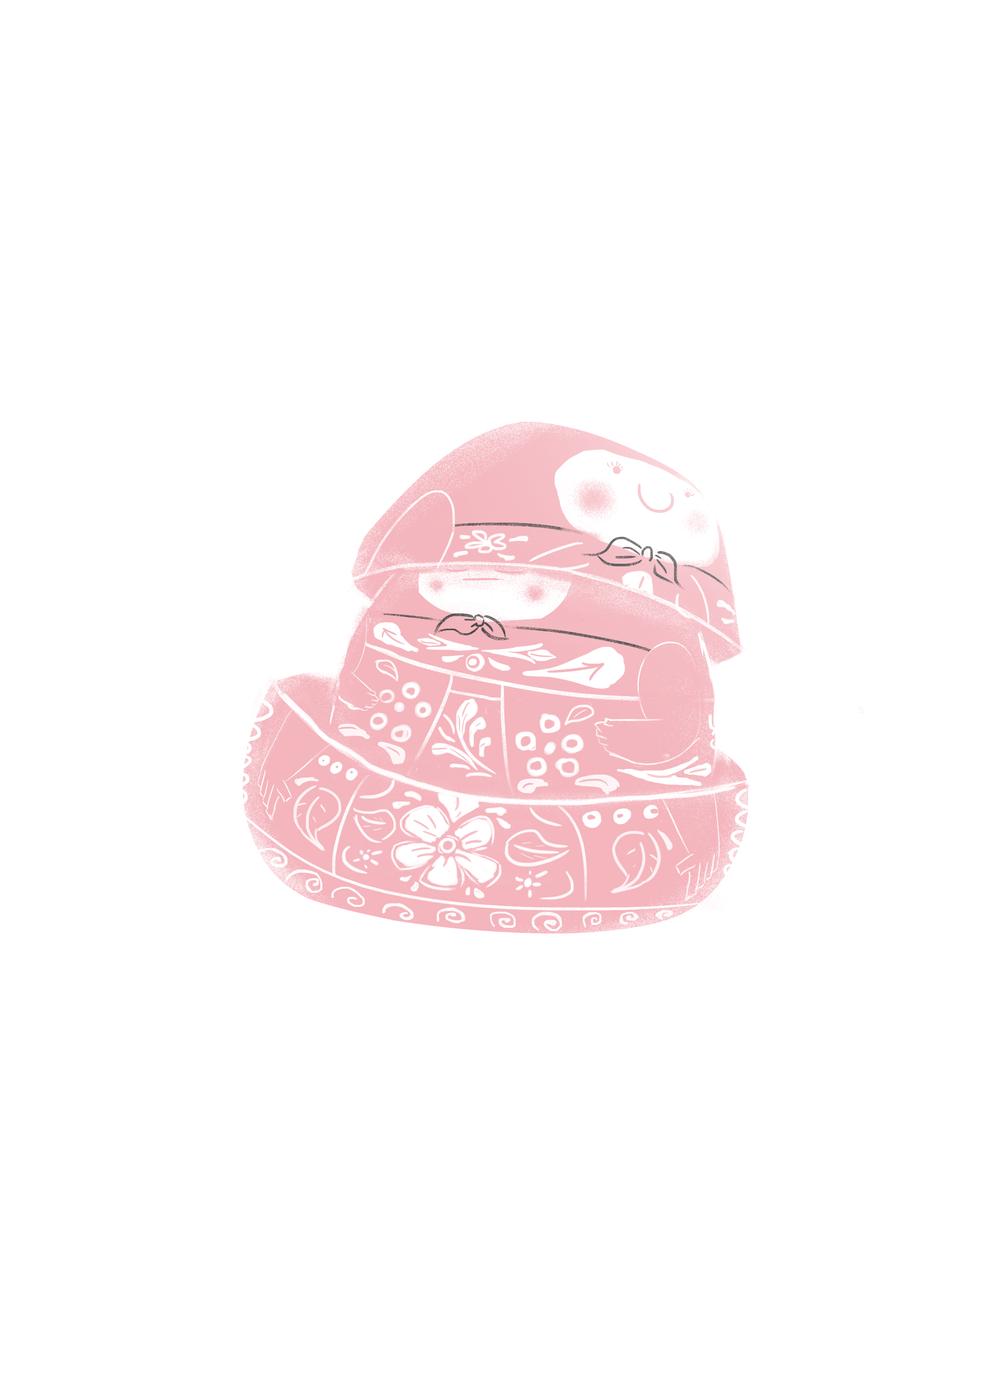 Week 05: Nesting Dolls